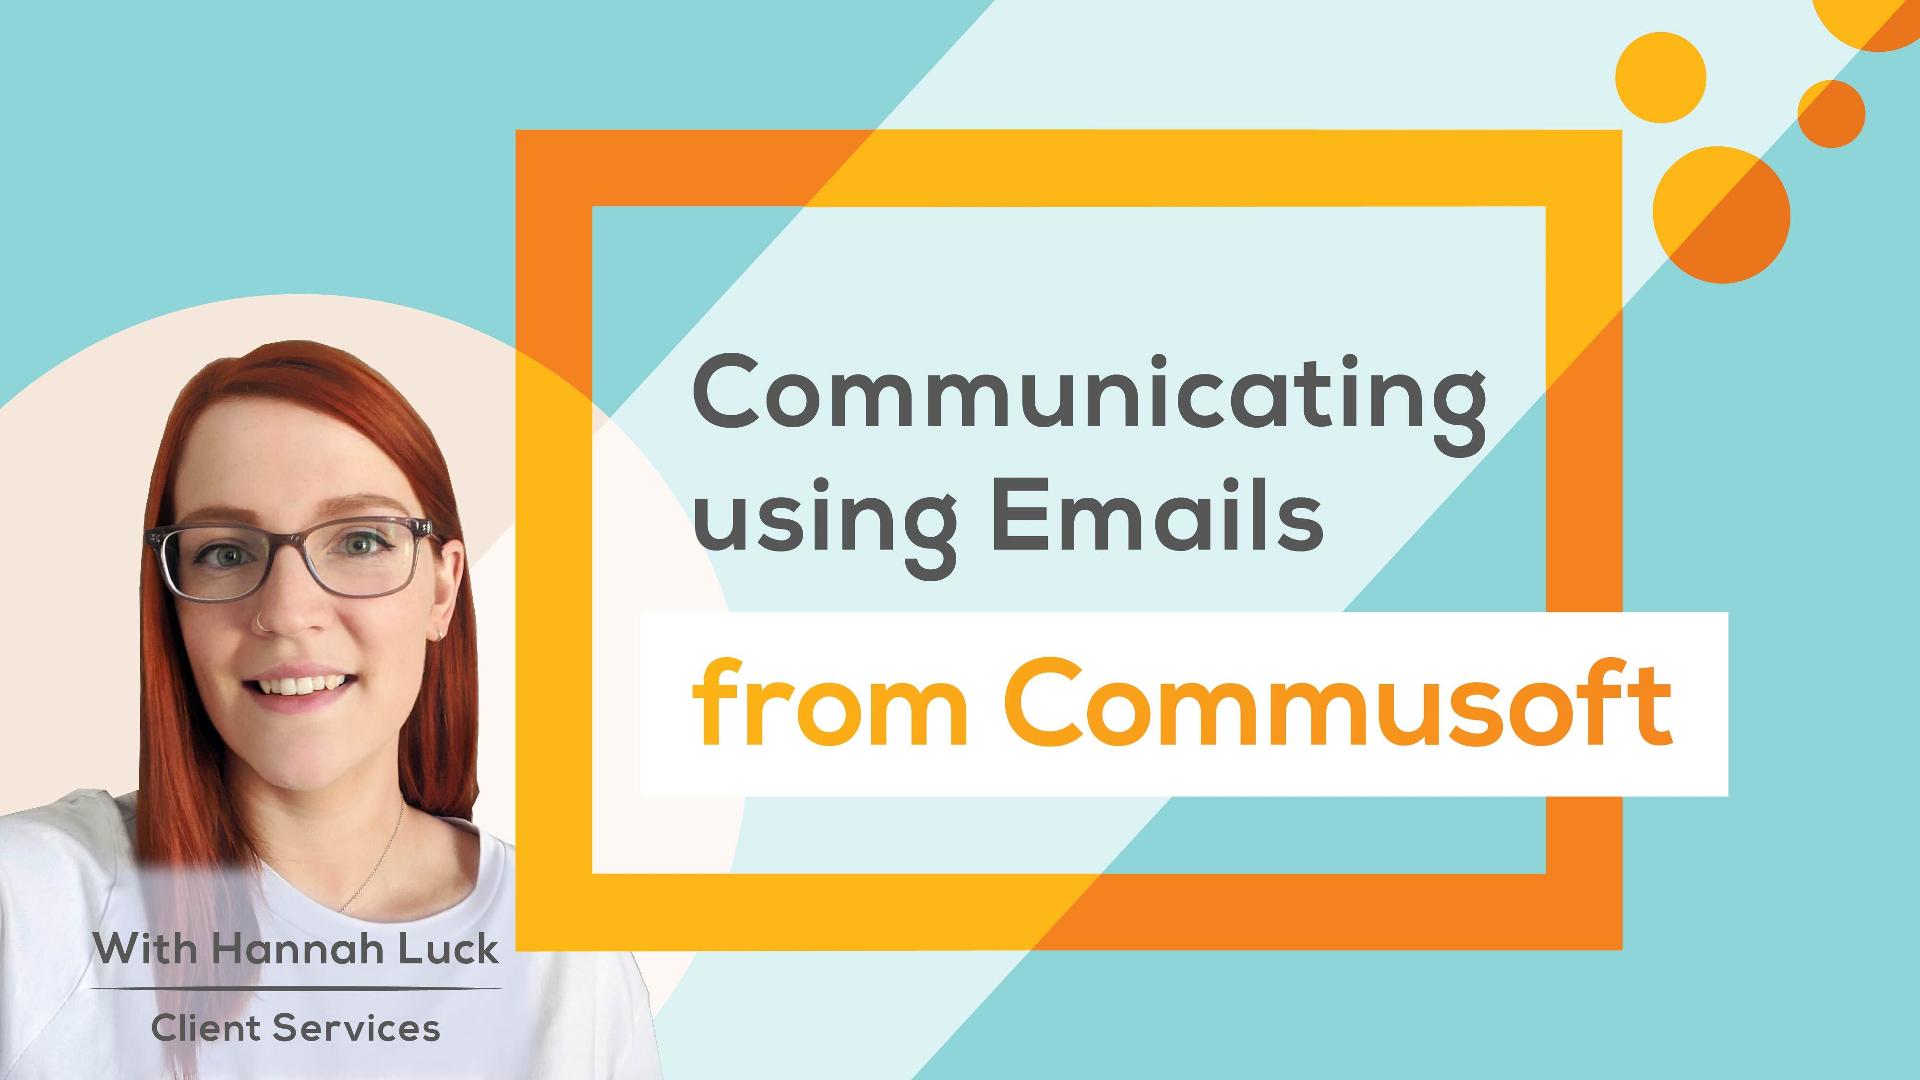 Communicating using Emails